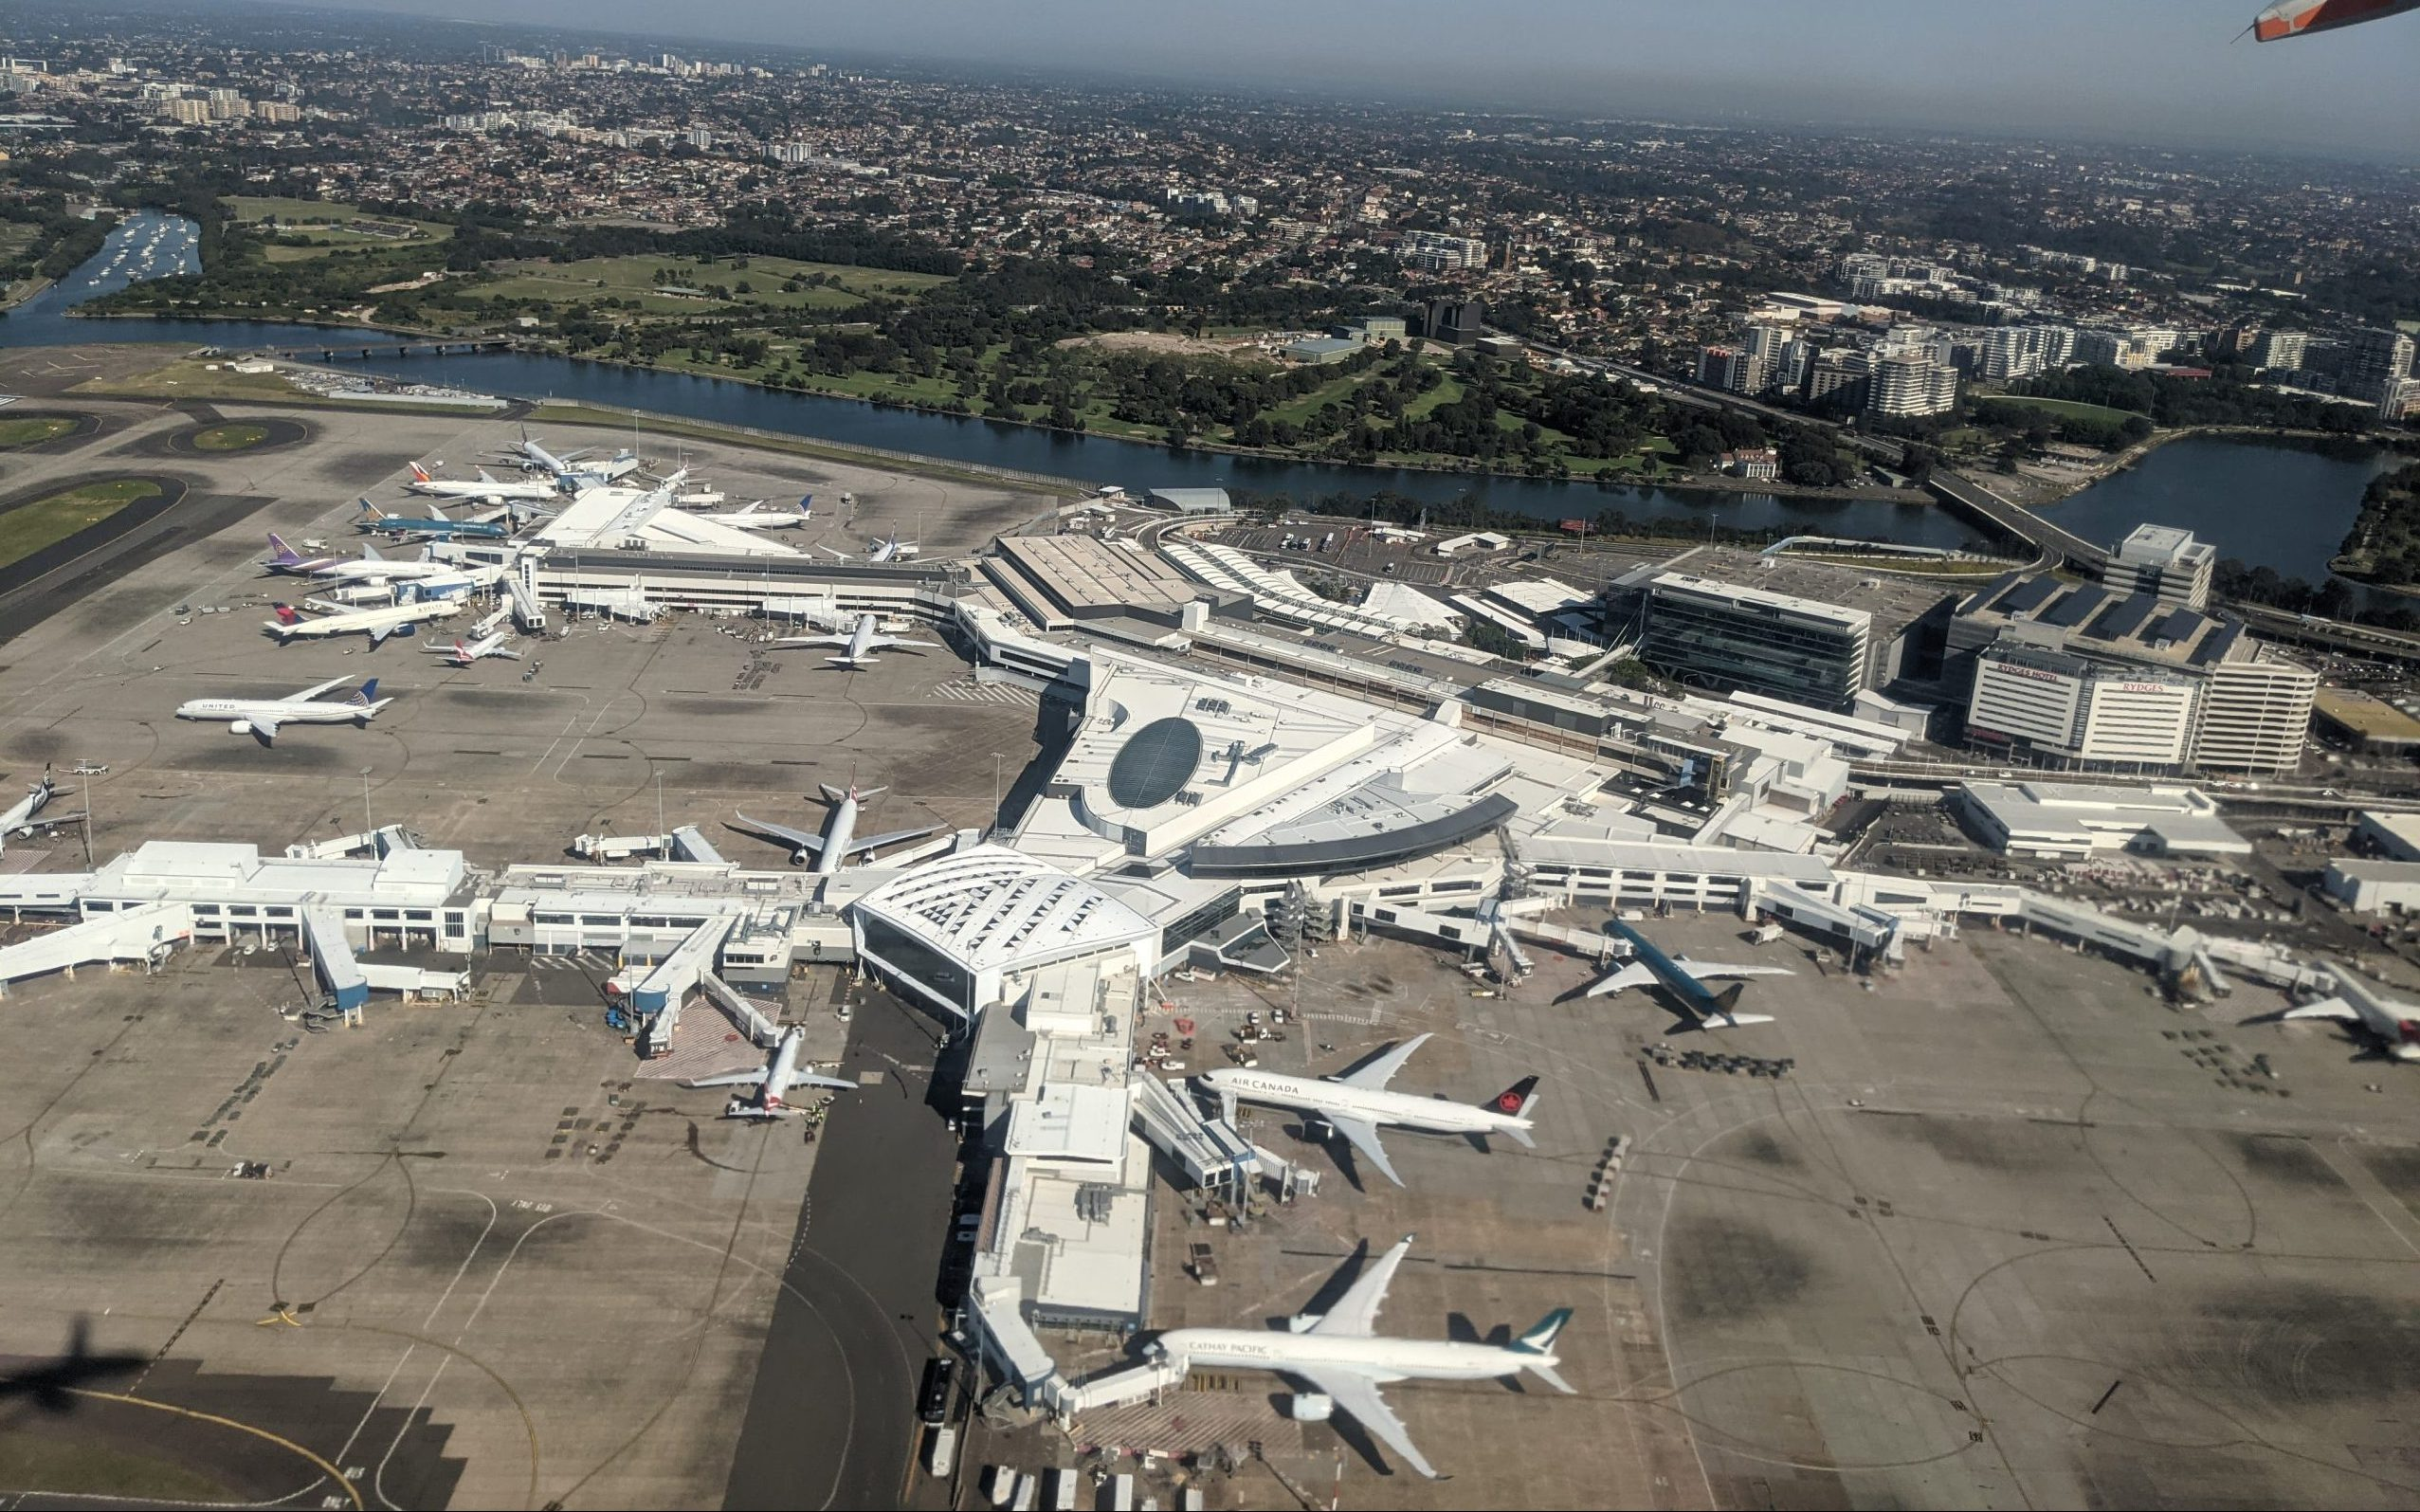 Terminal 1 i Sydney Airport. Foto: MDRX, CC 4.0